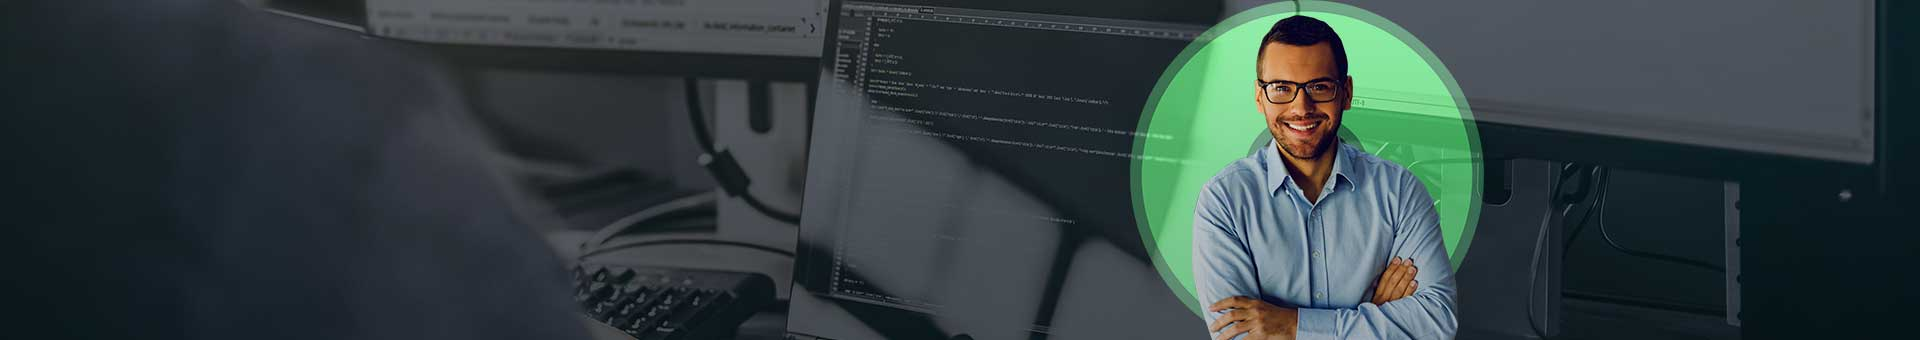 Hire Open Source Developers   Hire Open Source Programmers UK